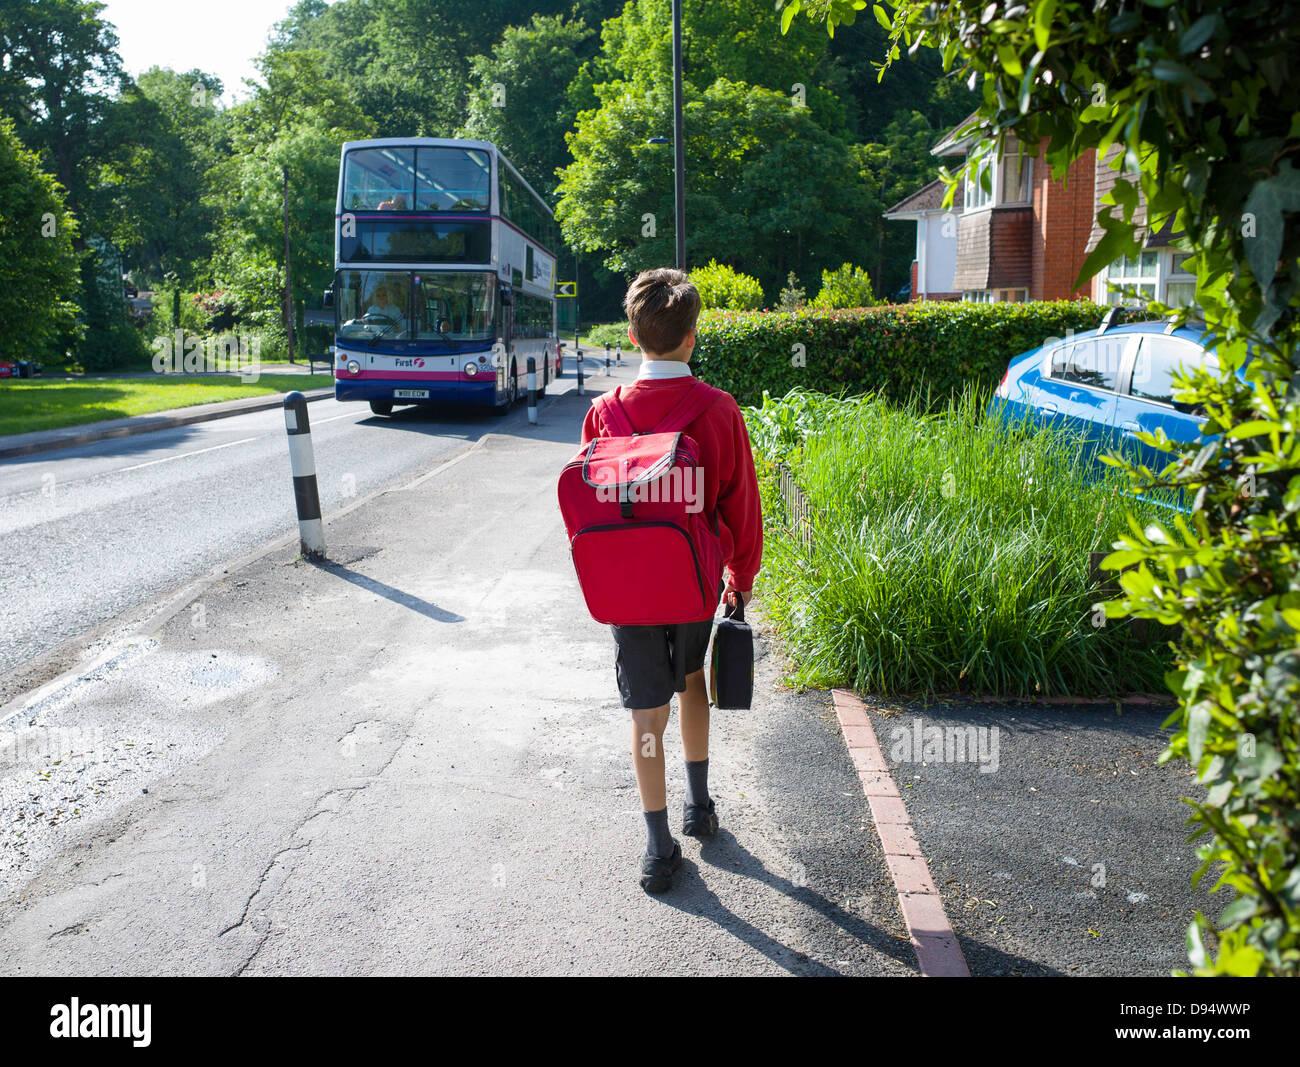 one young boy walks to school - Stock Image